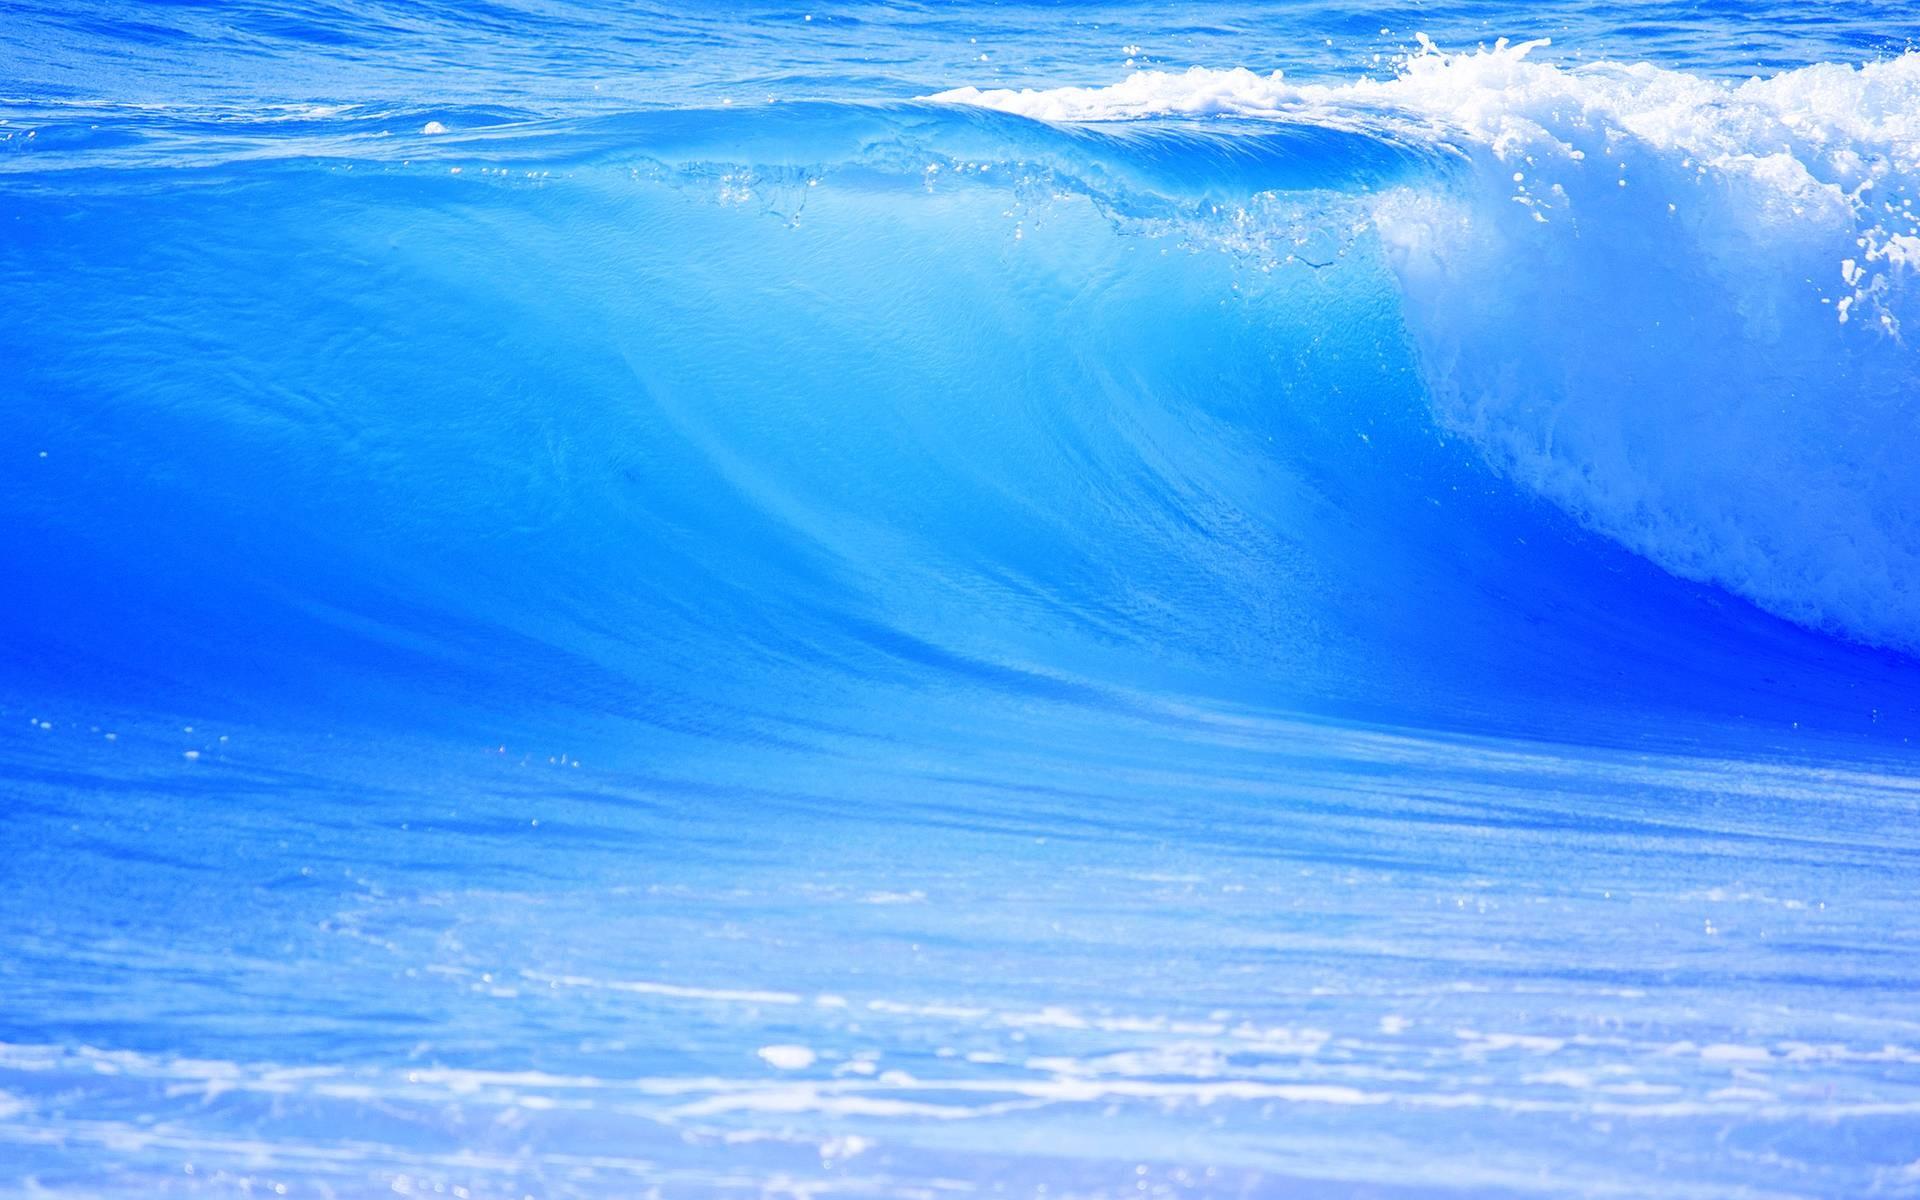 Wallpaper Under Sea Design Ideas ~ Wallpaper Sea Ocean Water Waves .